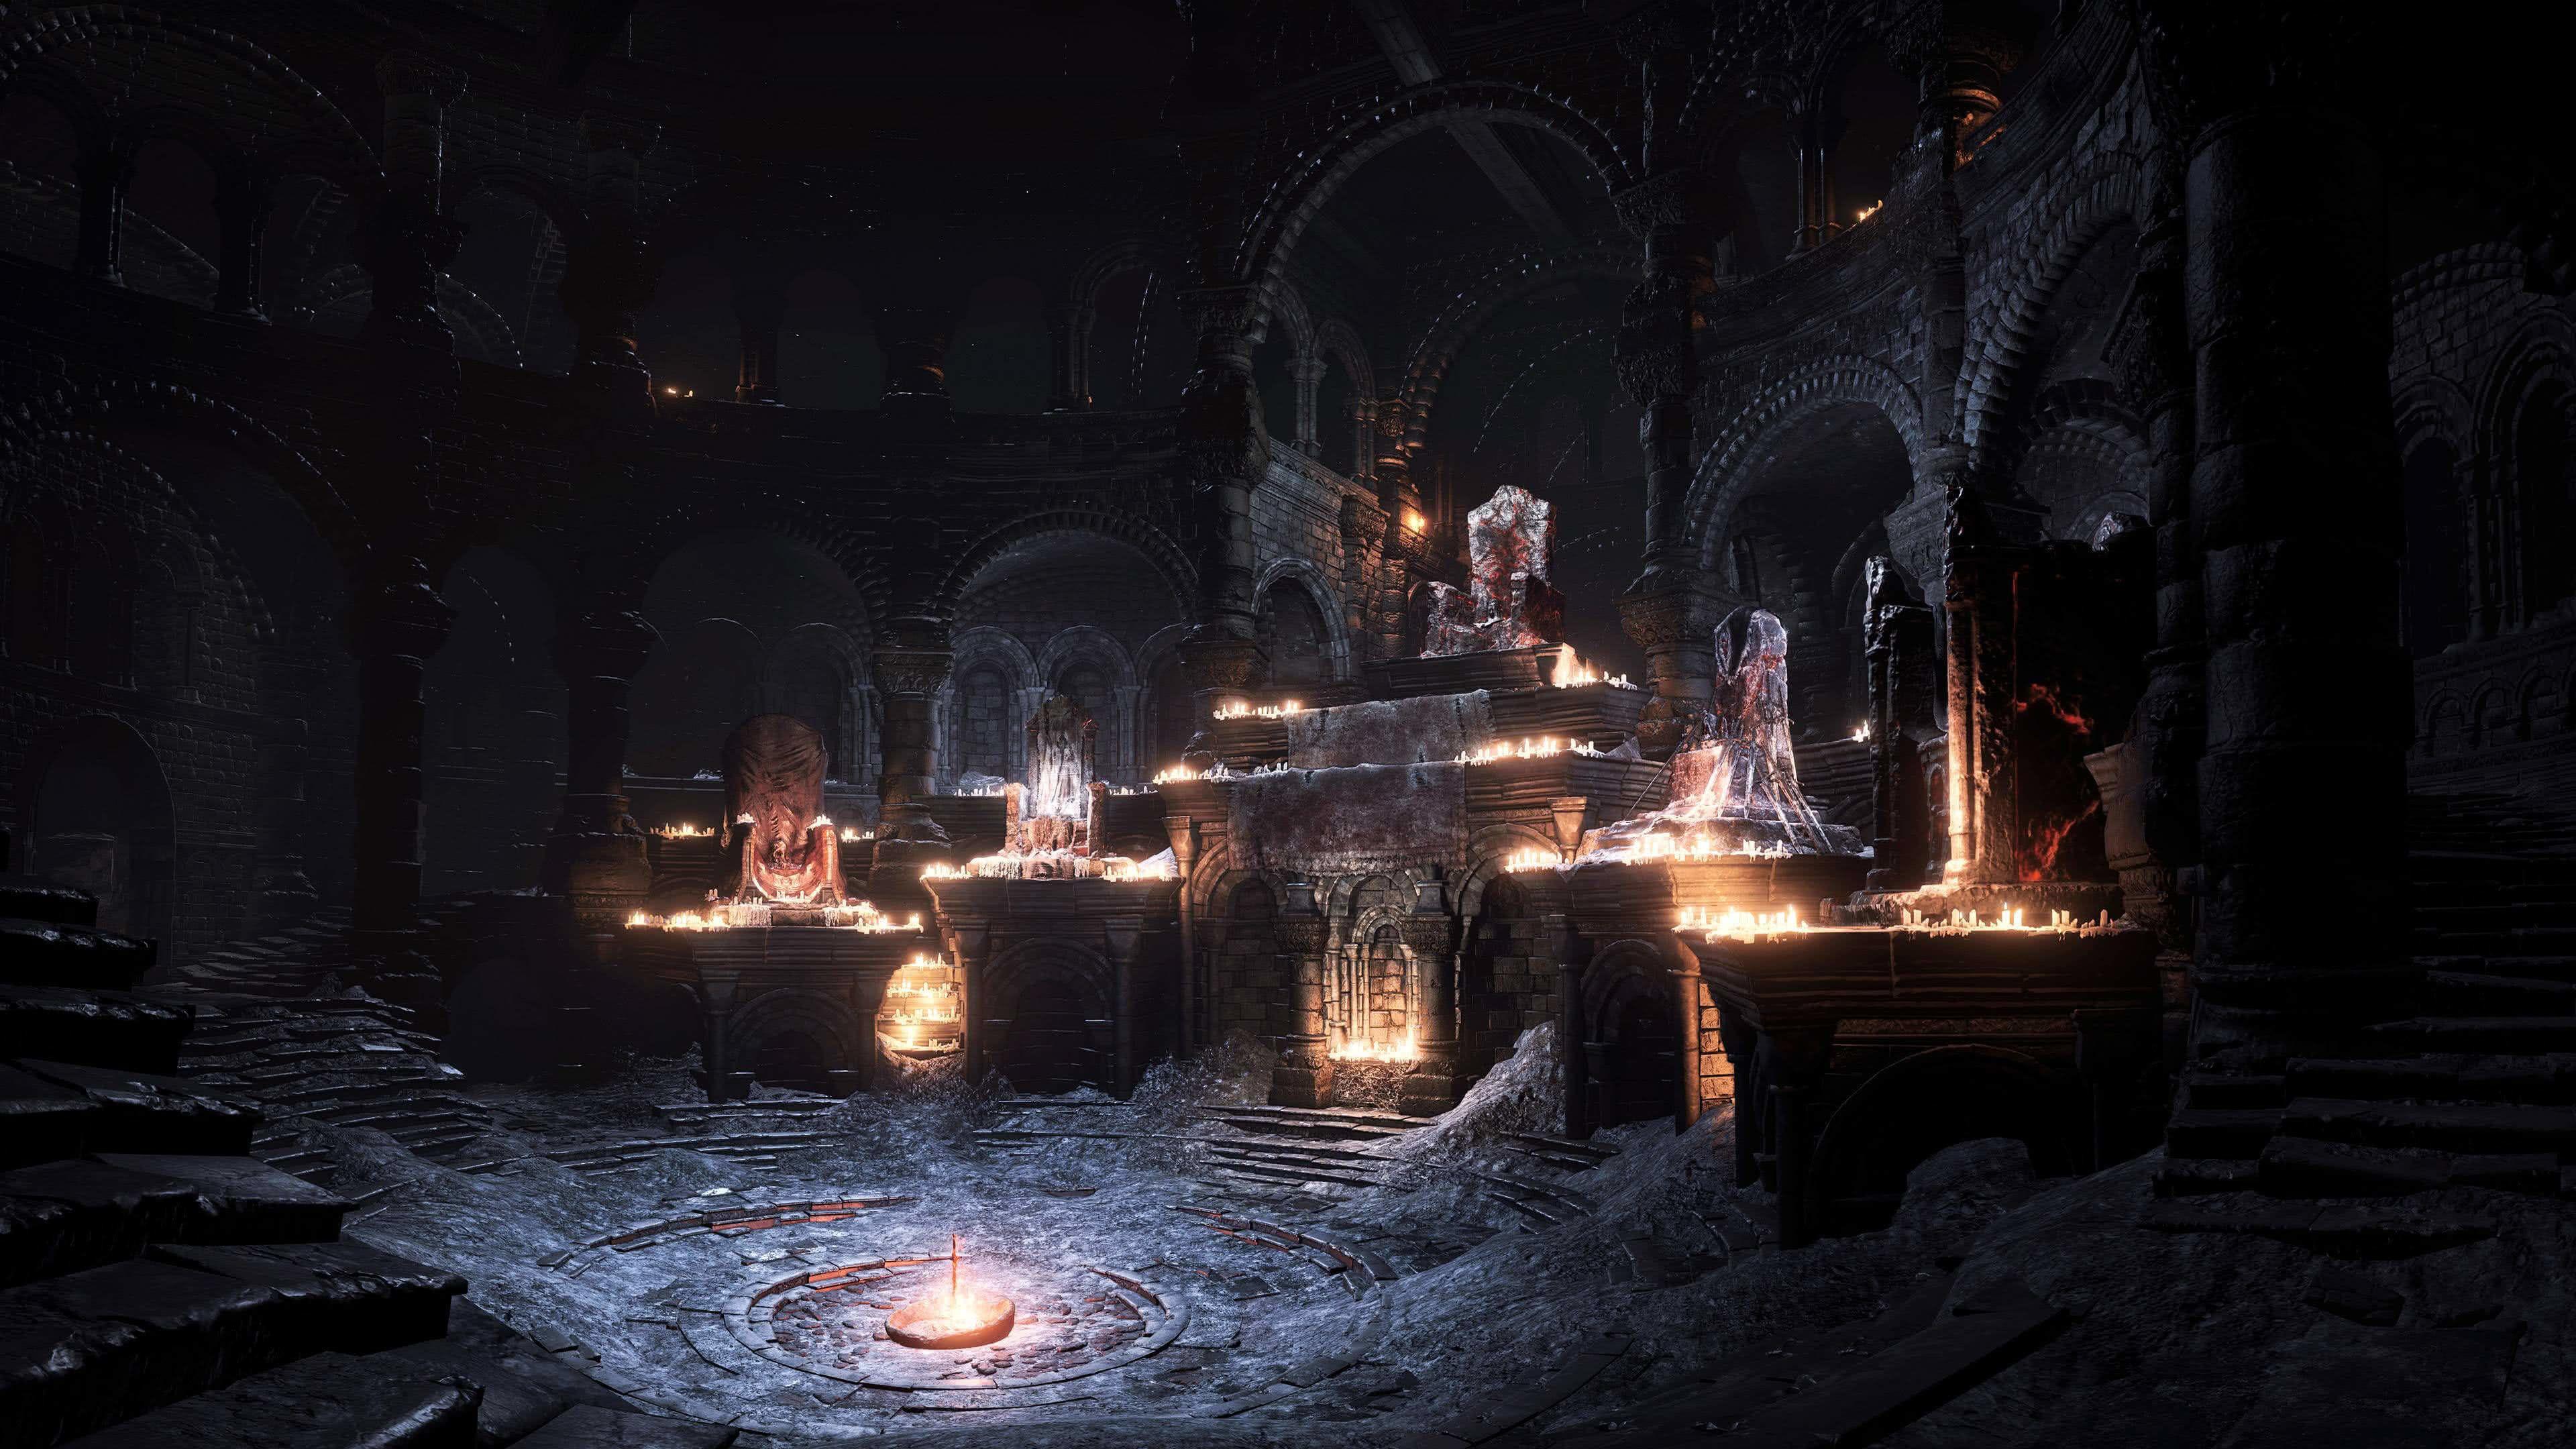 Res 3840x2160 Dark Souls 3 Firelink Shrine Uhd 4k Wallpaper In 2020 Dark Souls Wallpaper Dark Souls Dark Wallpaper